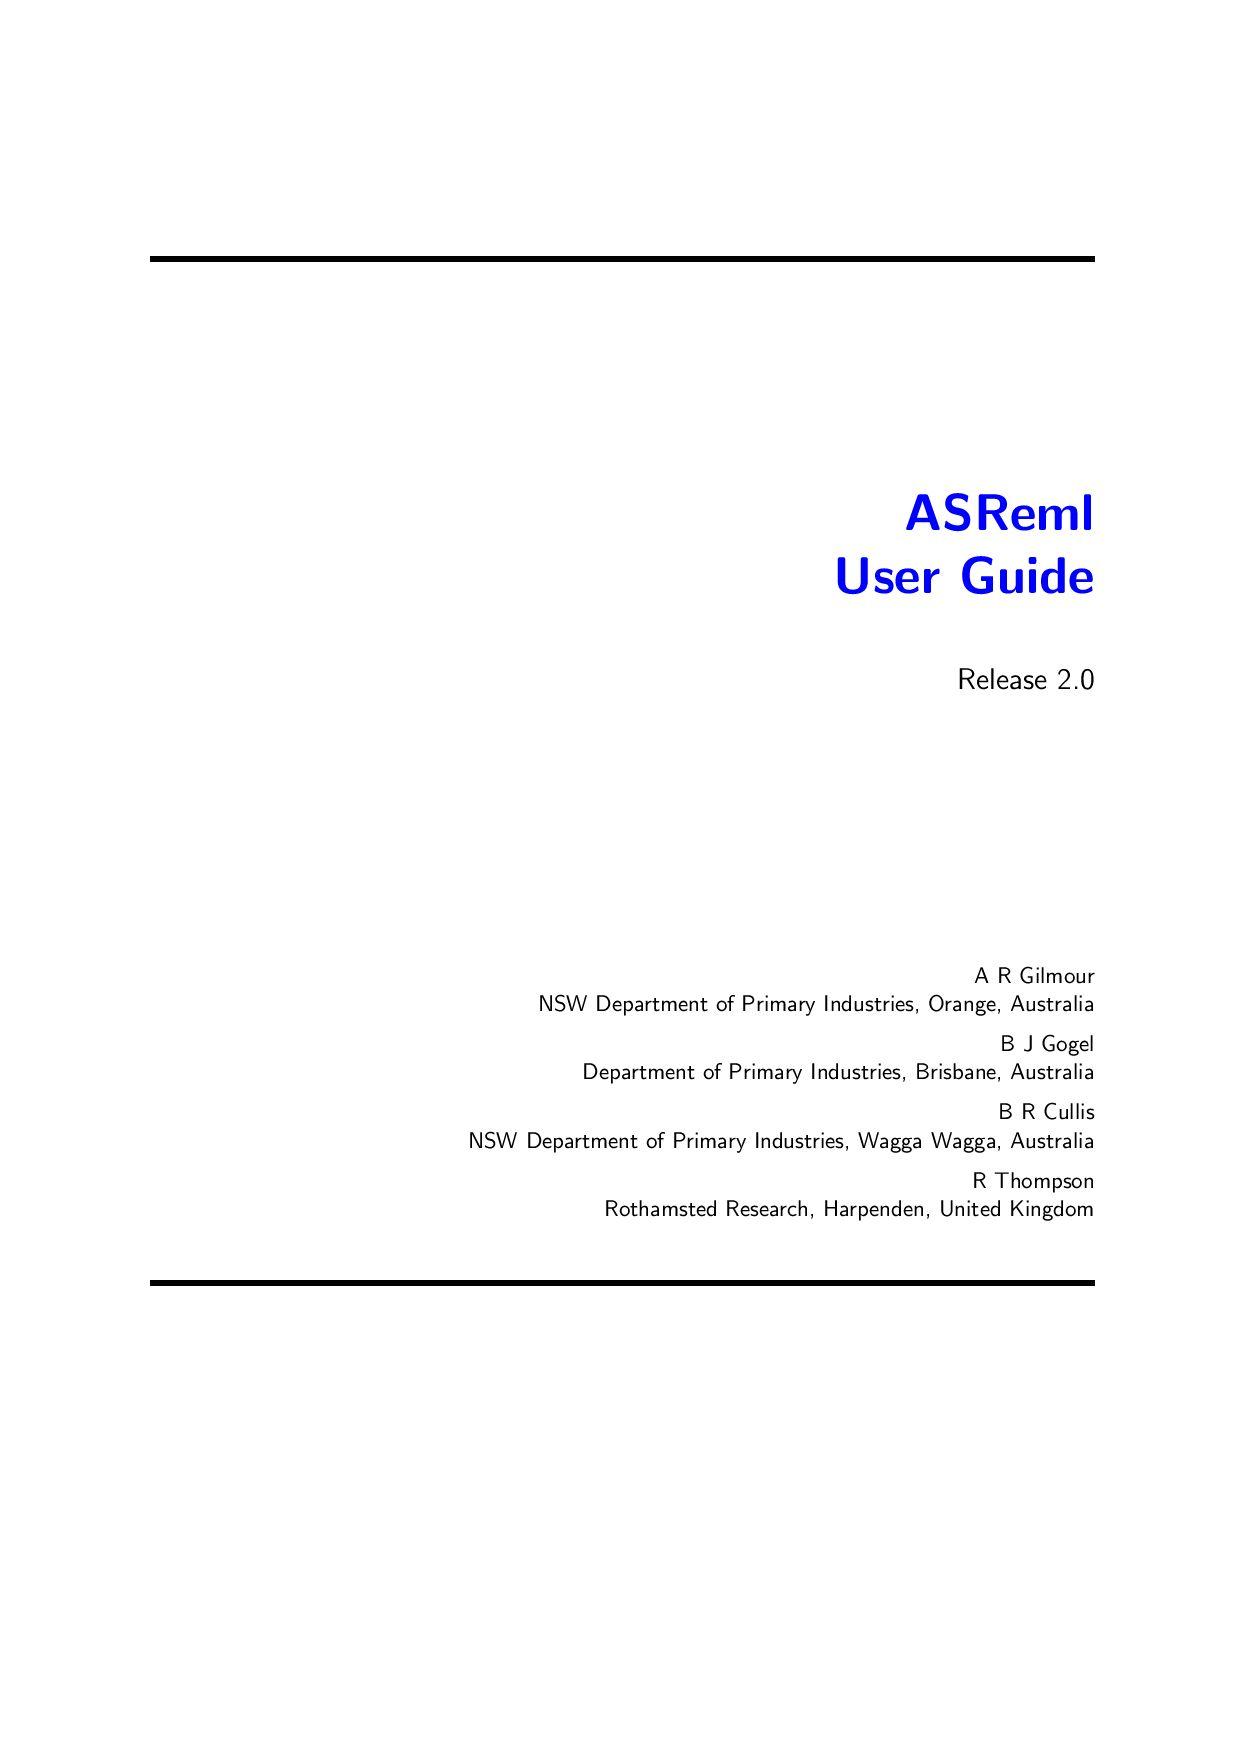 ASREML by A. Molina - issuu